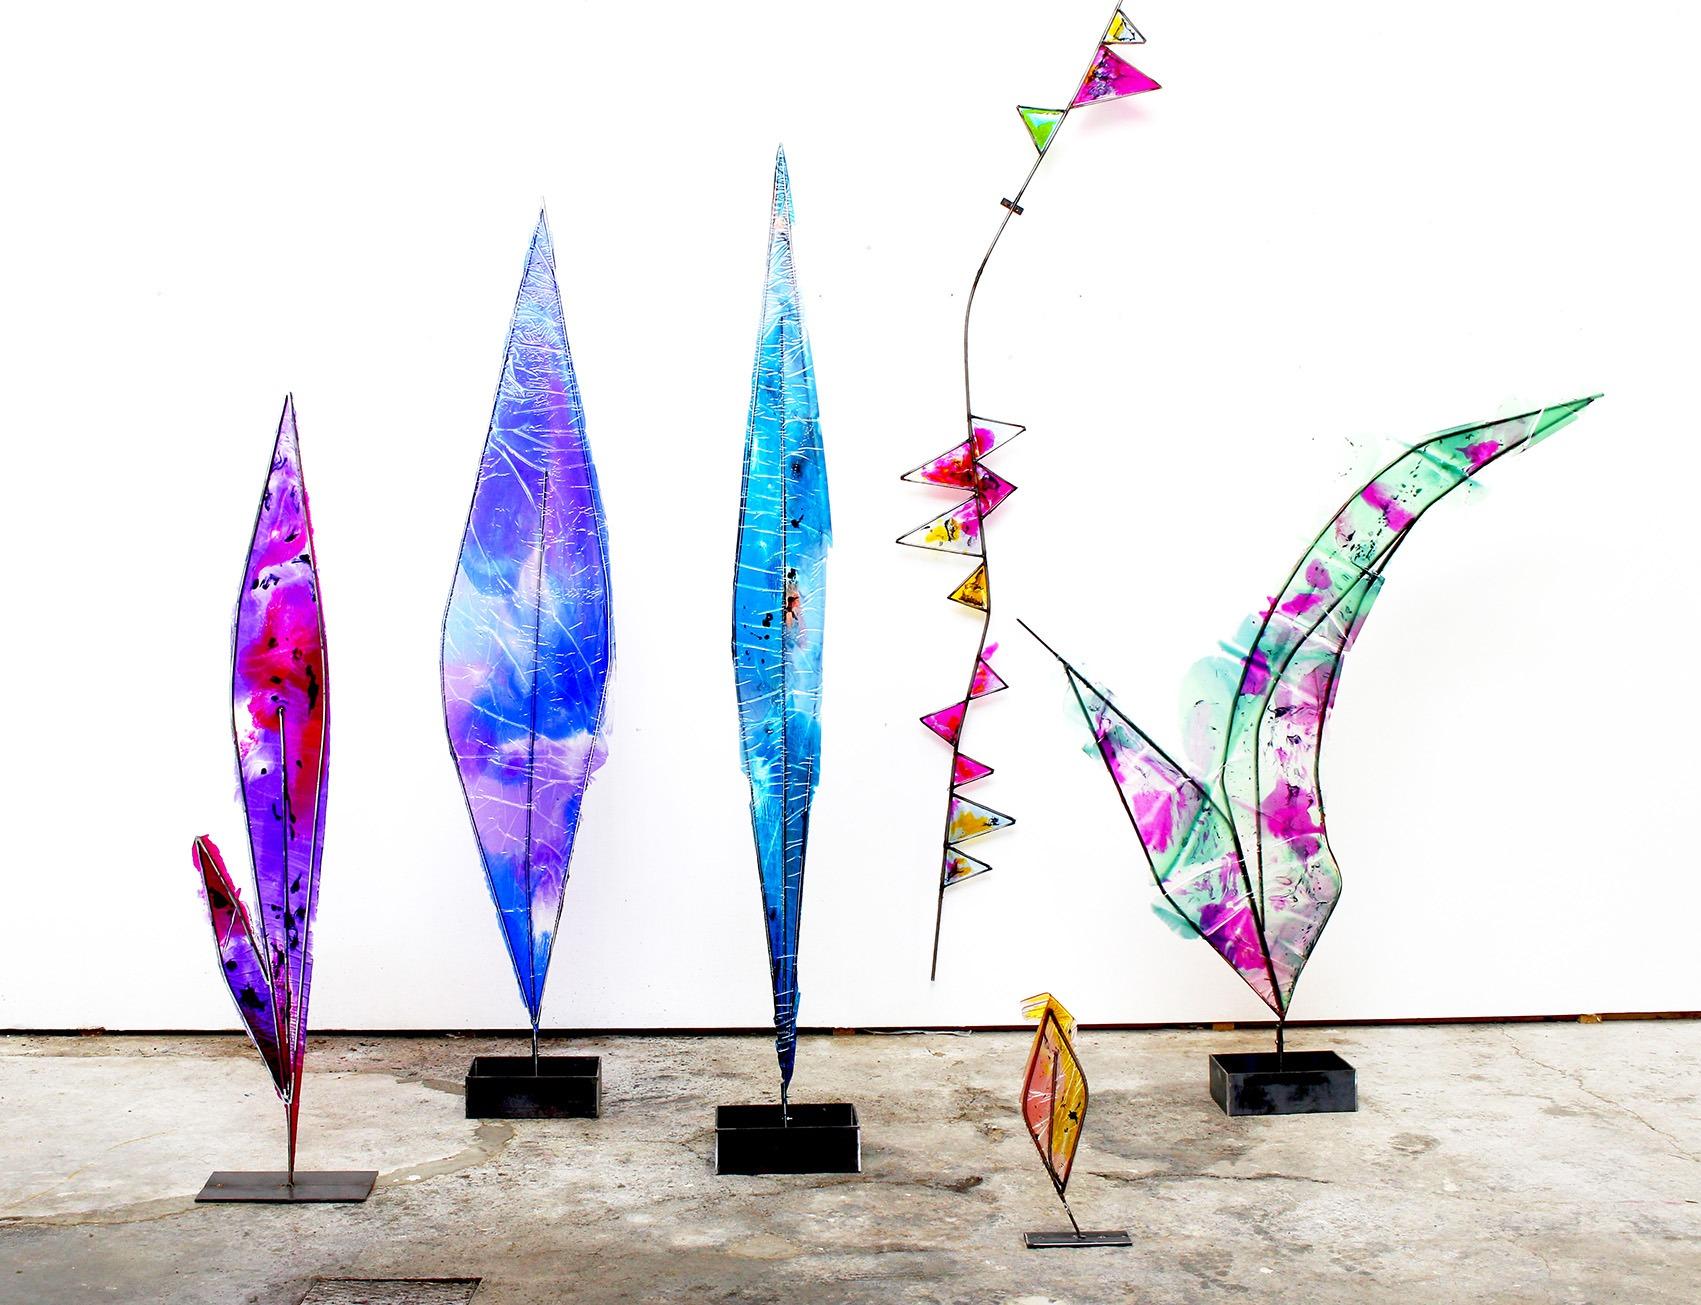 Romain Vicari - Installation, résine, acier, colorants. Aubervilliers